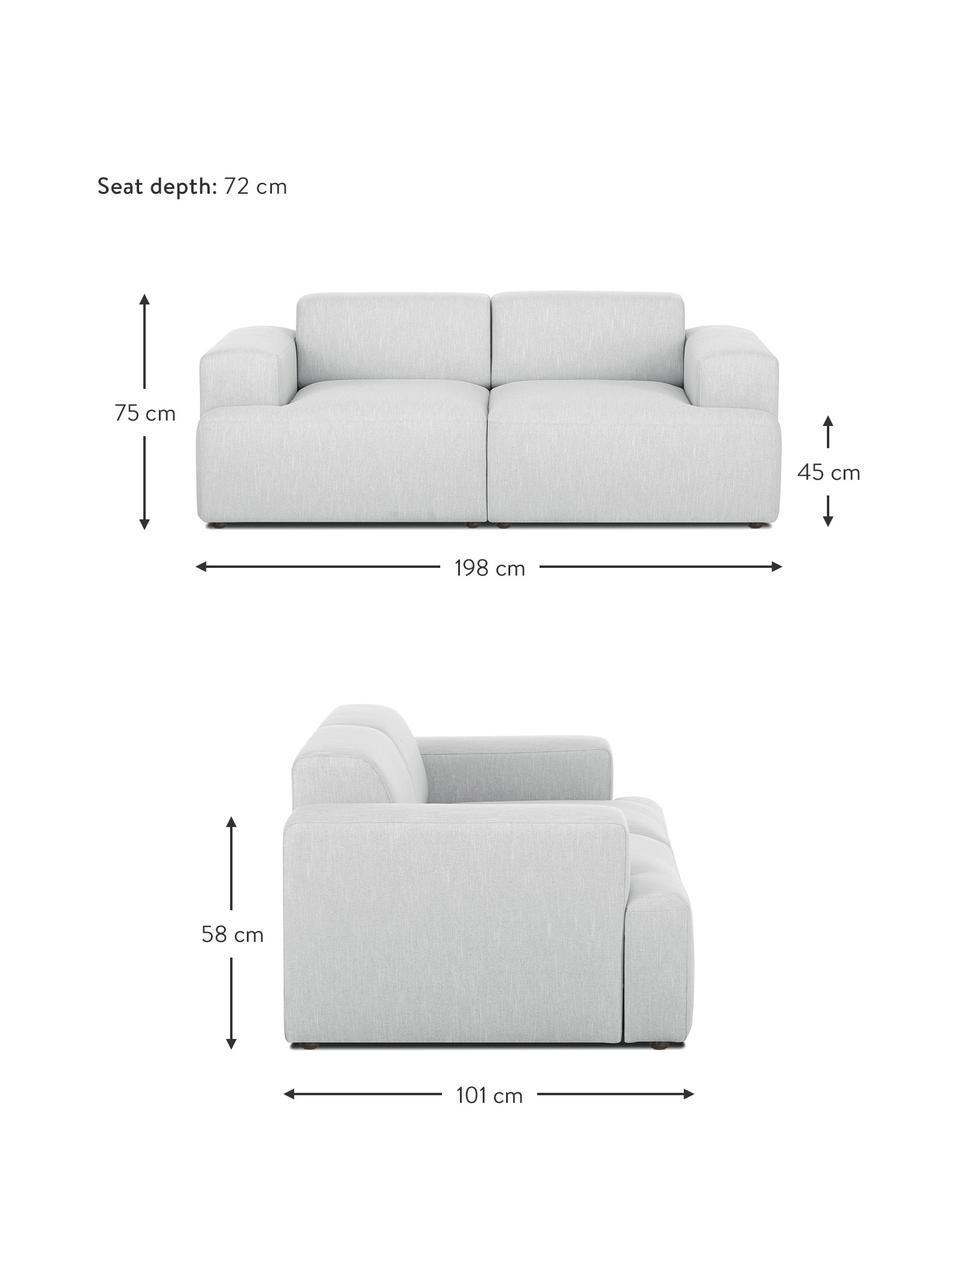 Sofa Melva (2-Sitzer) in Hellgrau, Bezug: 100% Polyester Der hochwe, Gestell: Massives Kiefernholz, FSC, Füße: Kunststoff, Webstoff Hellgrau, B 198 x T 101 cm